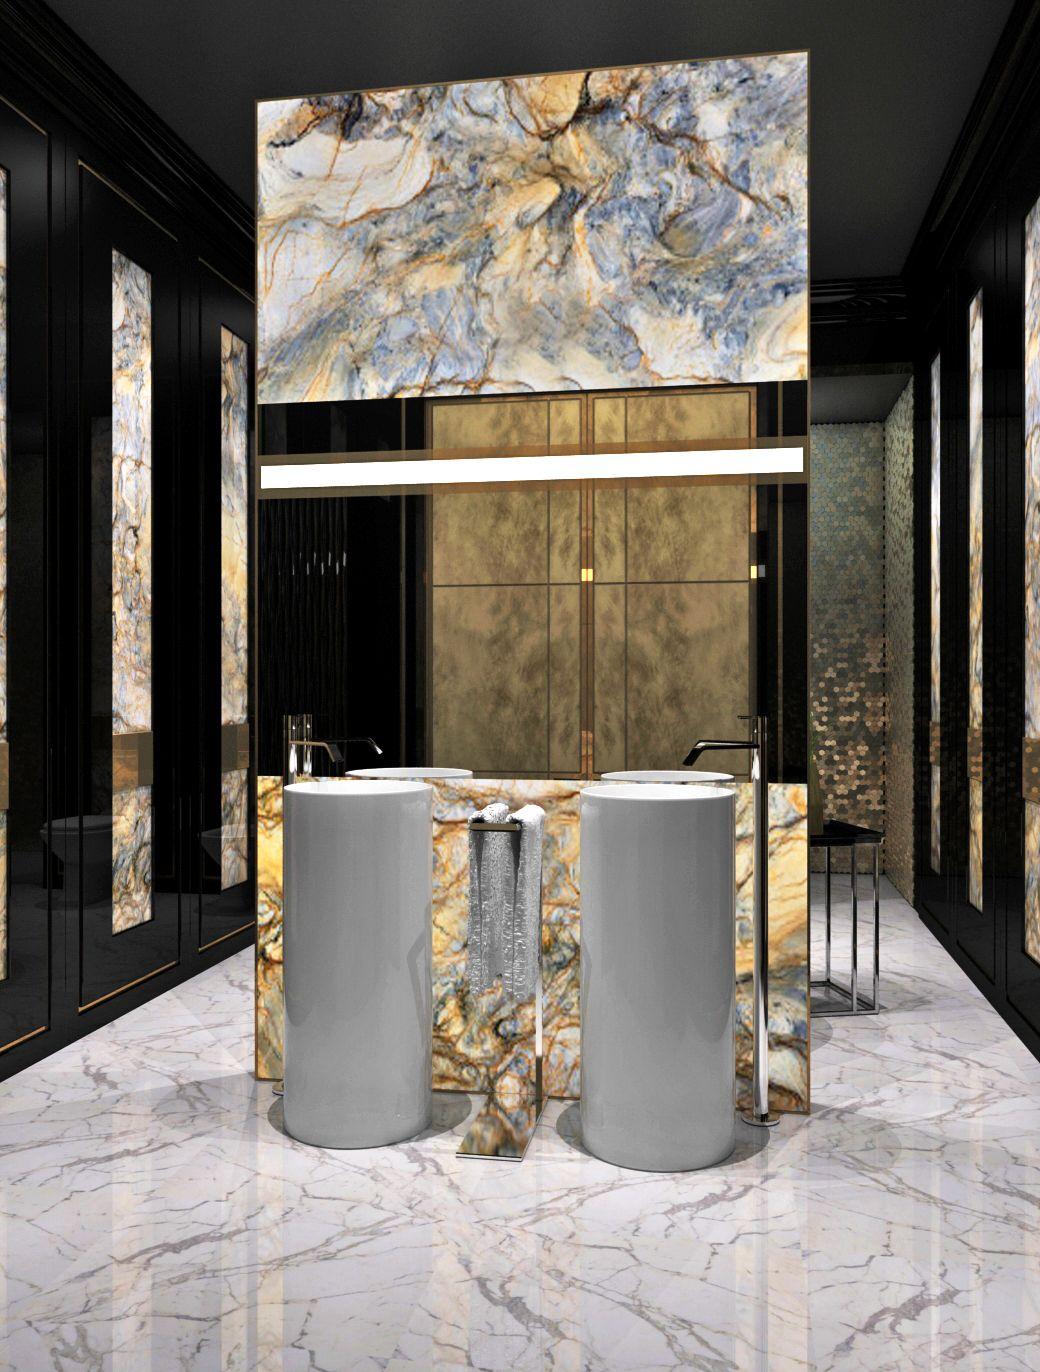 Modern, Traditional, and Transitional Rooms | Luxury interior design,  Bathroom interior design, Rustic doors interior